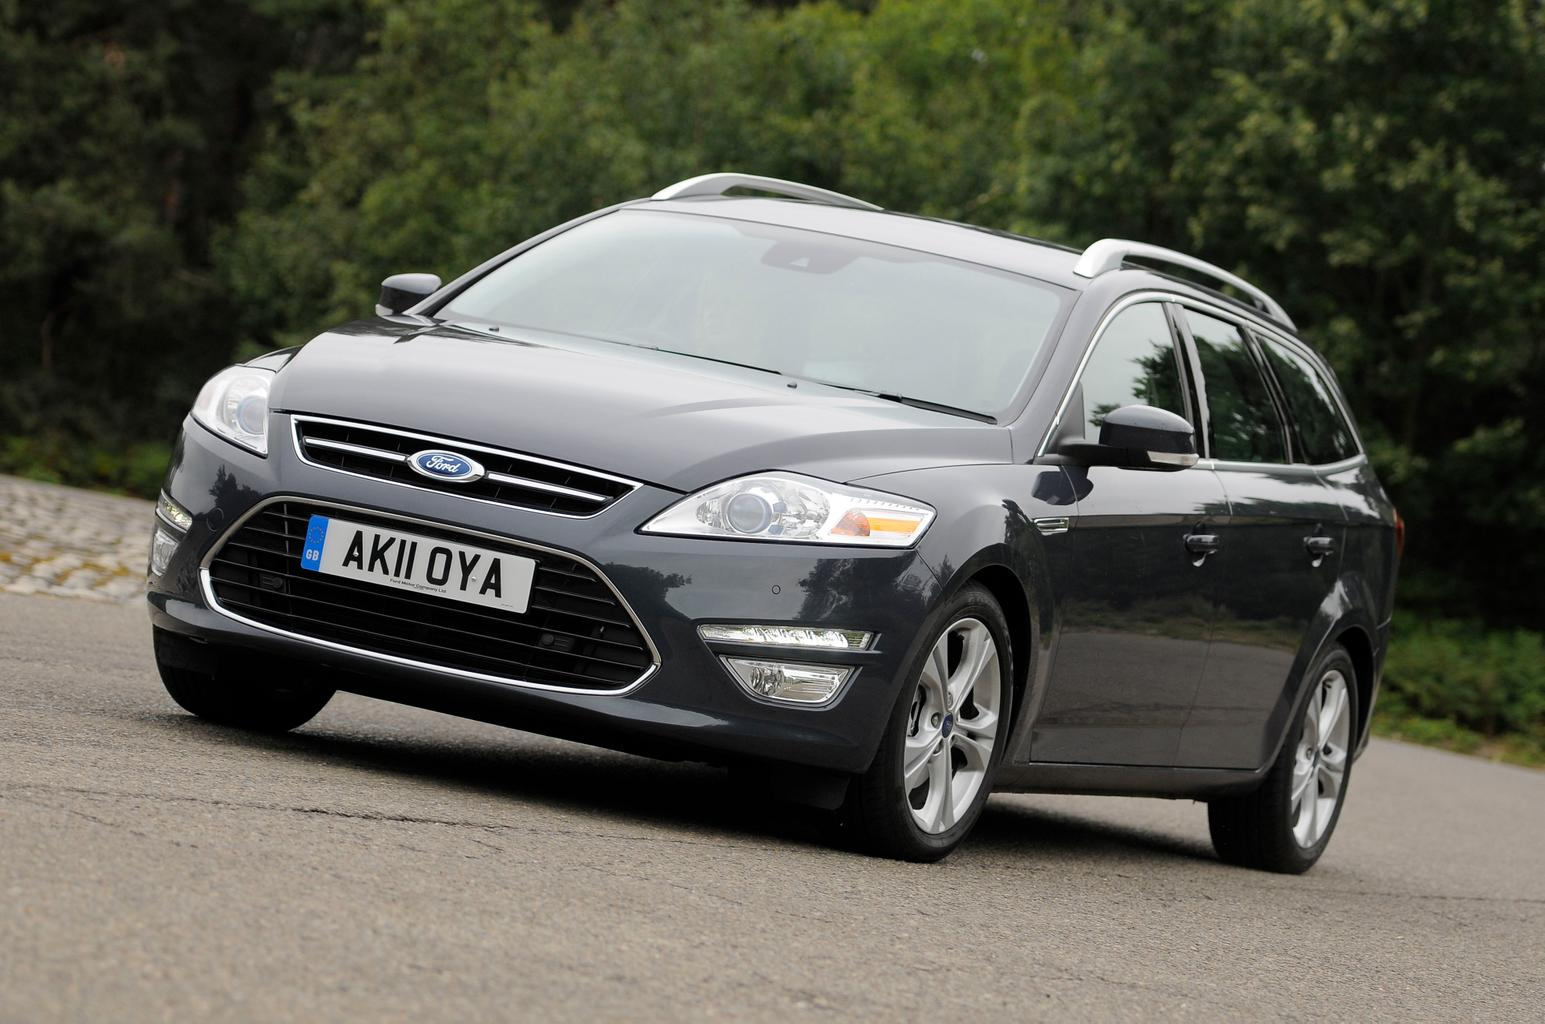 Used estate cars tested: Ford Mondeo vs Skoda Superb vs Peugeot 508